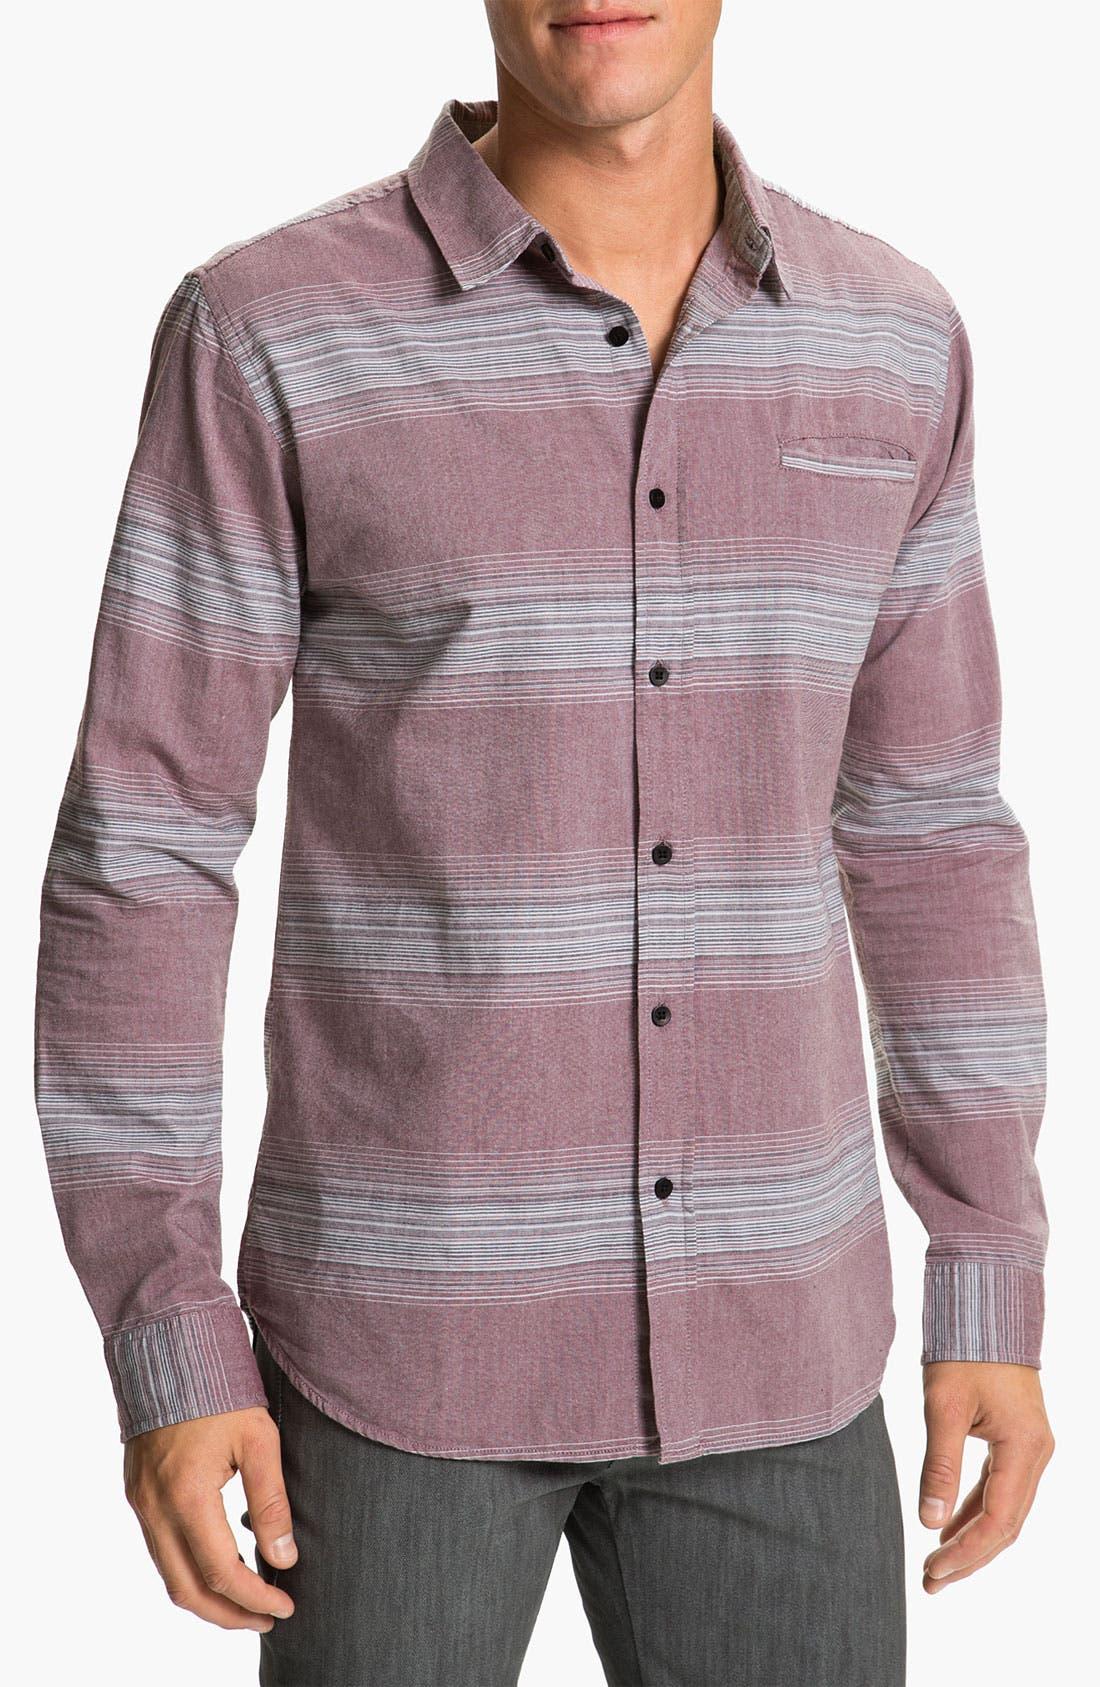 Alternate Image 1 Selected - Ezekiel 'Oceanside' Woven Shirt